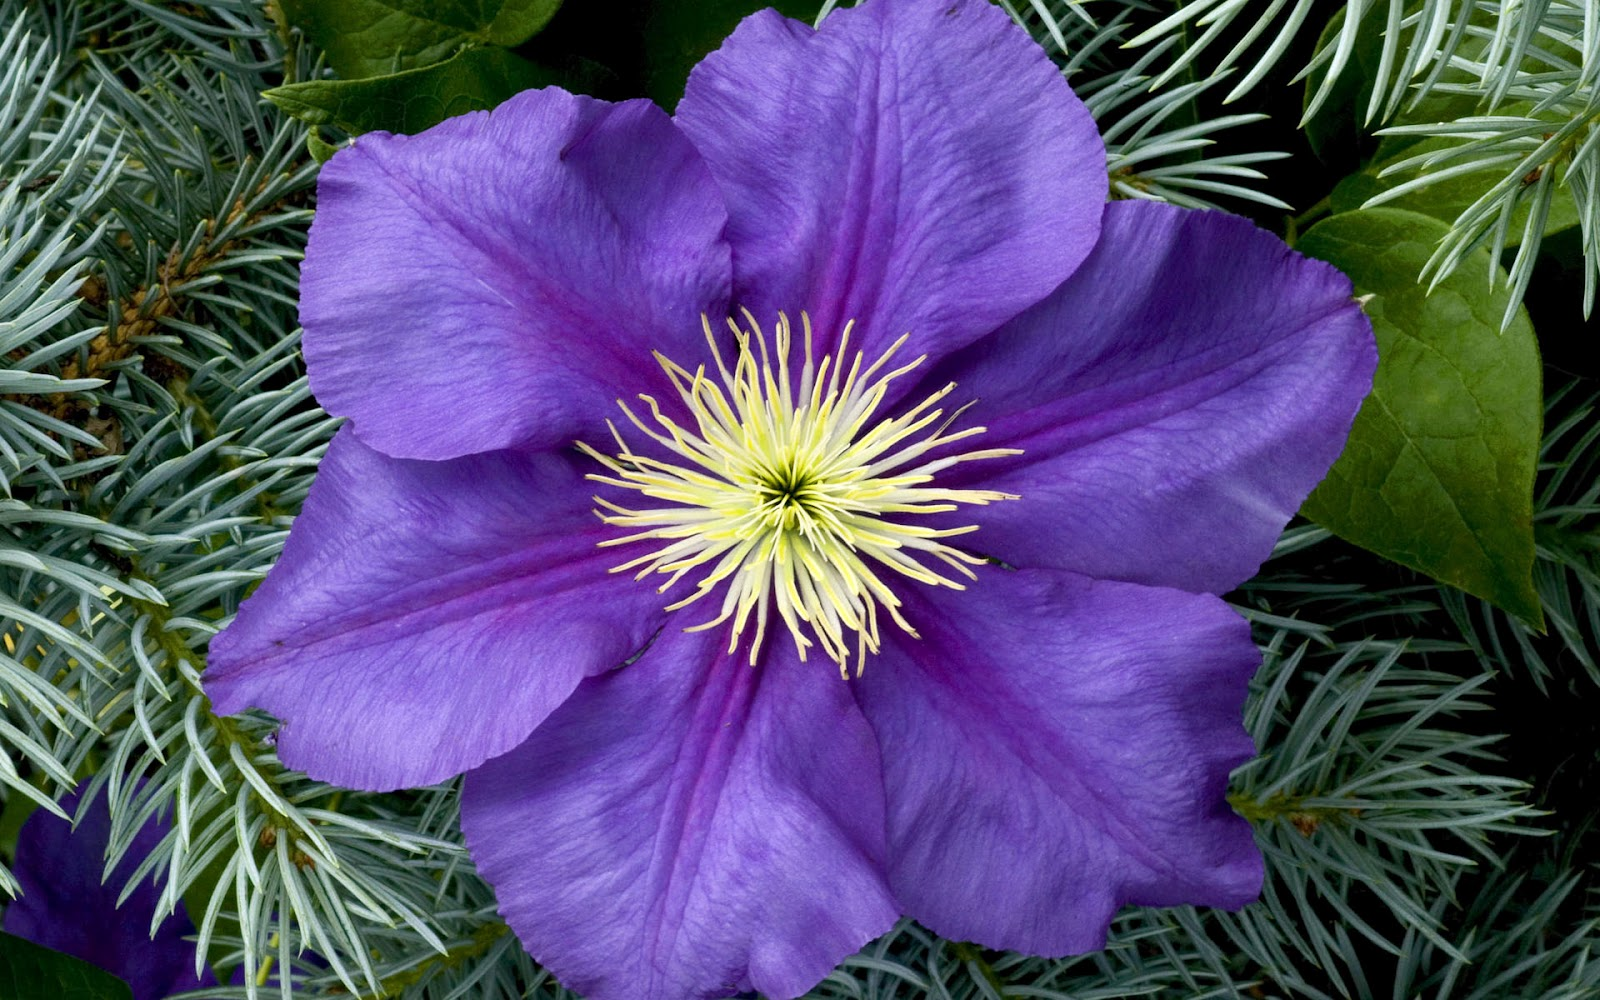 http://2.bp.blogspot.com/-_YLVzcF53PY/T14nYzP34EI/AAAAAAAAAVs/NsYroX-YoV8/s1600/Wonderful+Flowers+HD+Wallpapers+%2846%29.jpg